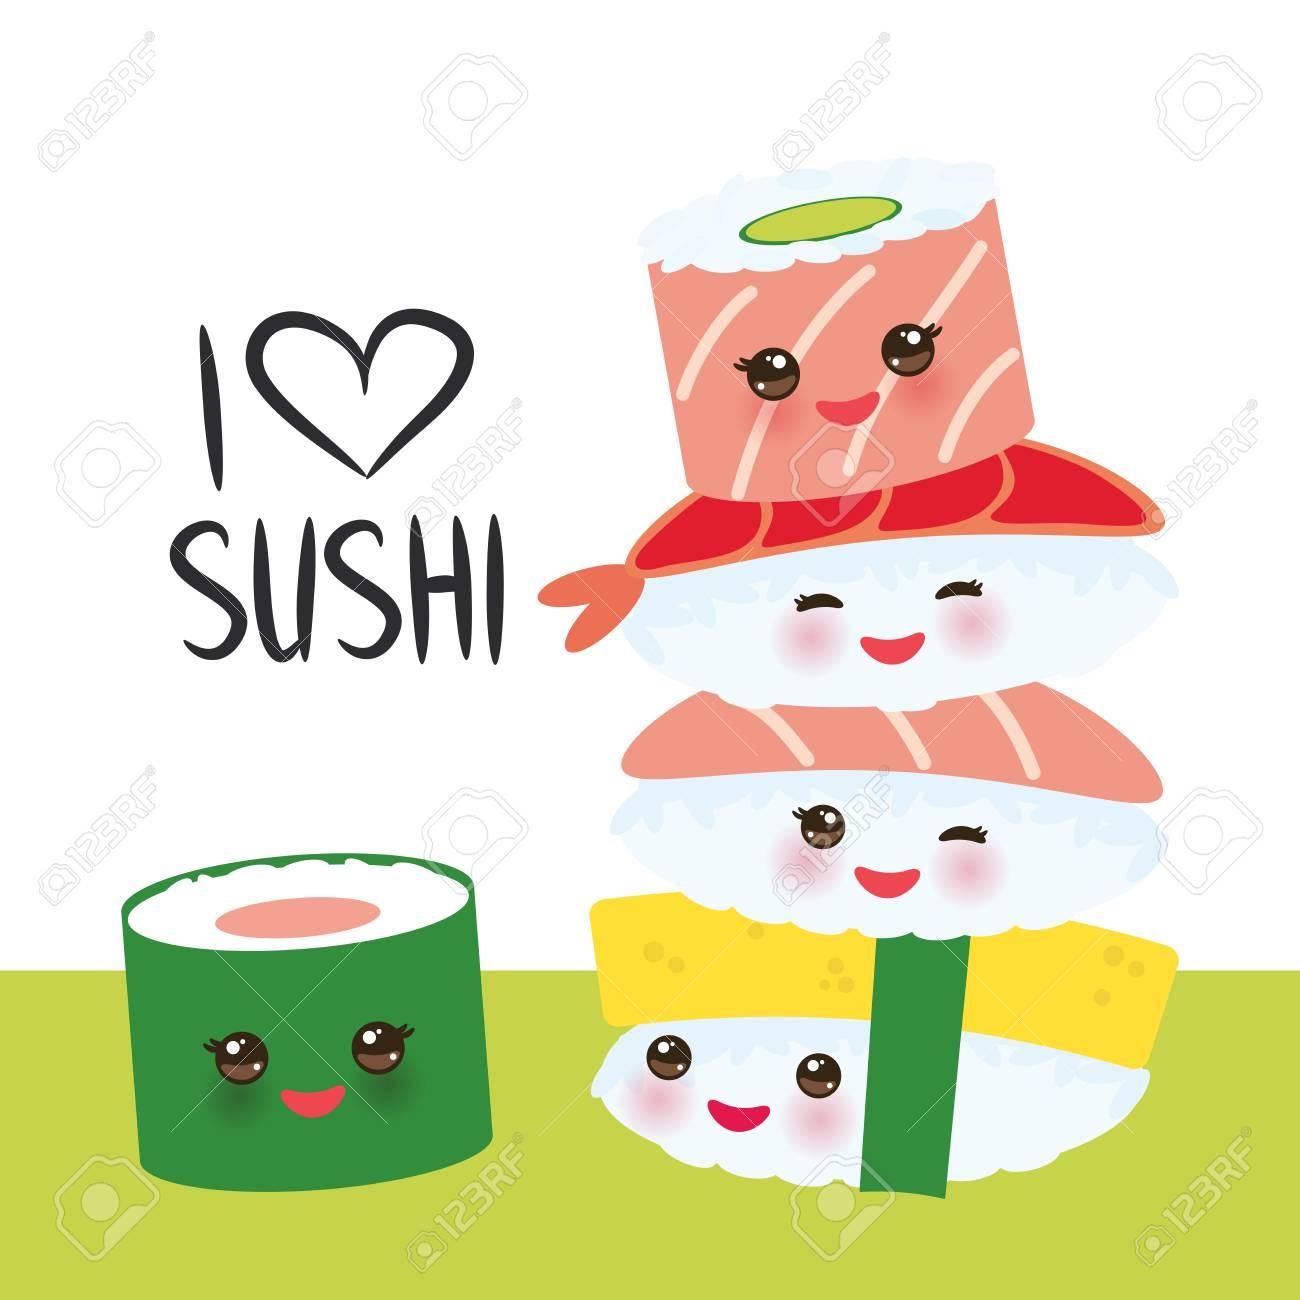 dc93af69f I love sushi. Kawaii funny sushi set with pink cheeks and big eyes, emoji